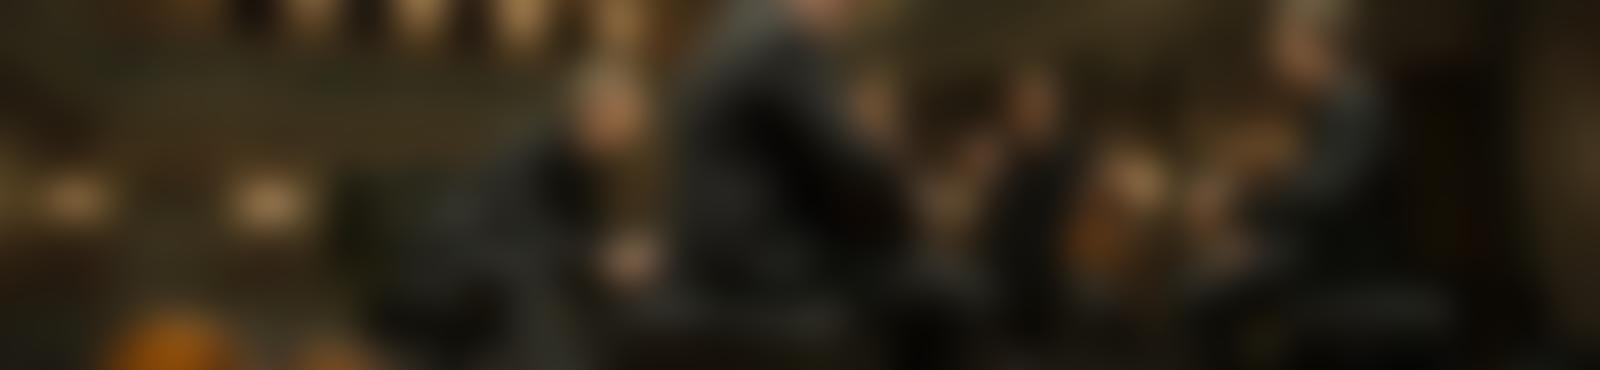 Blurred 607f908d dd73 41e6 9205 b0ecacd32e3d